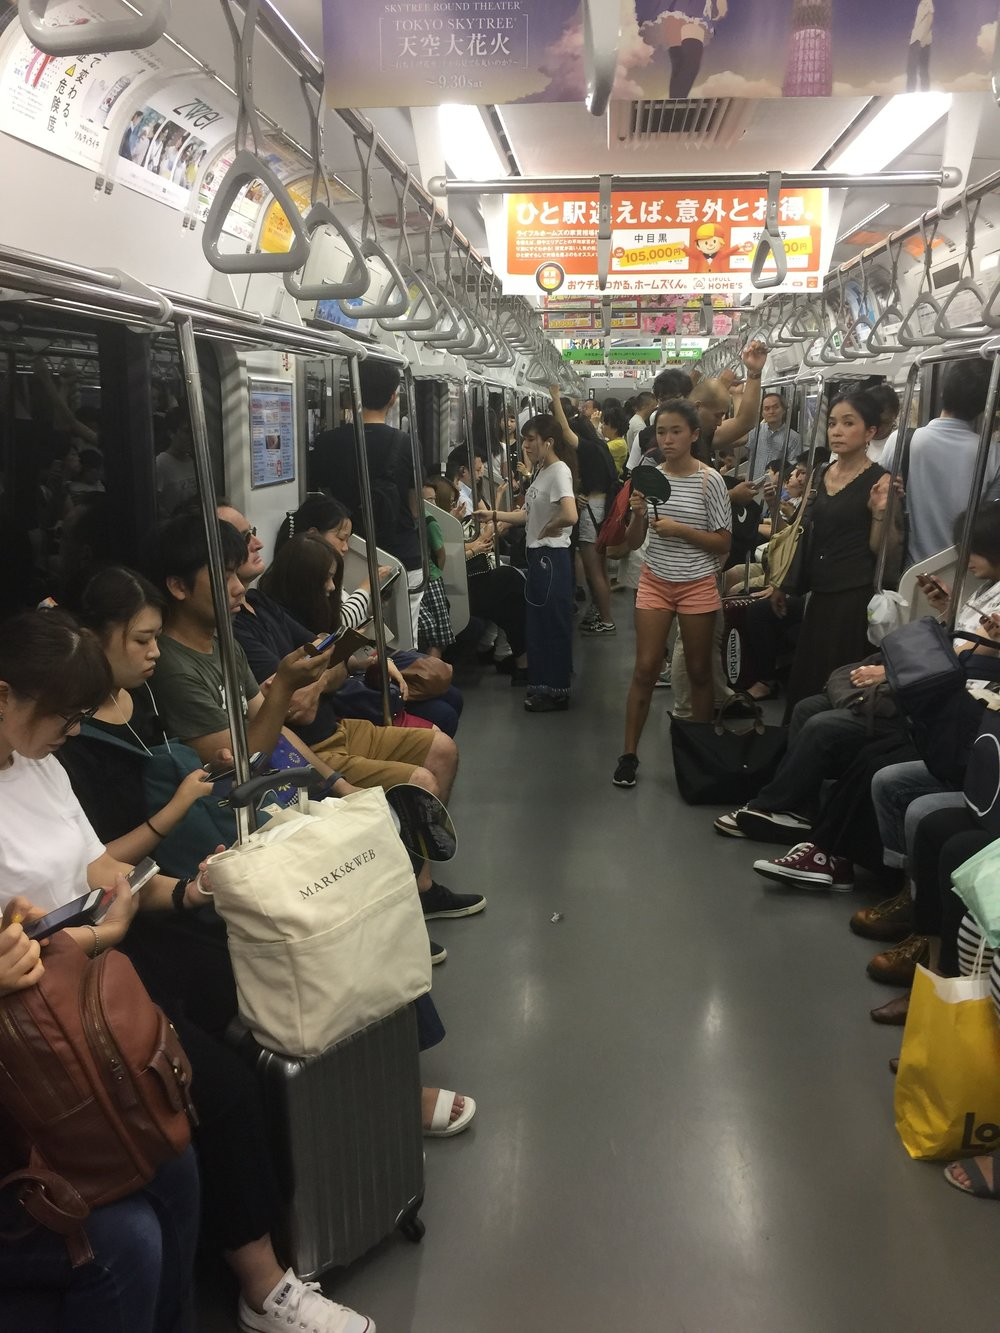 Photo 26-08-2017, 12 06 12.jpg